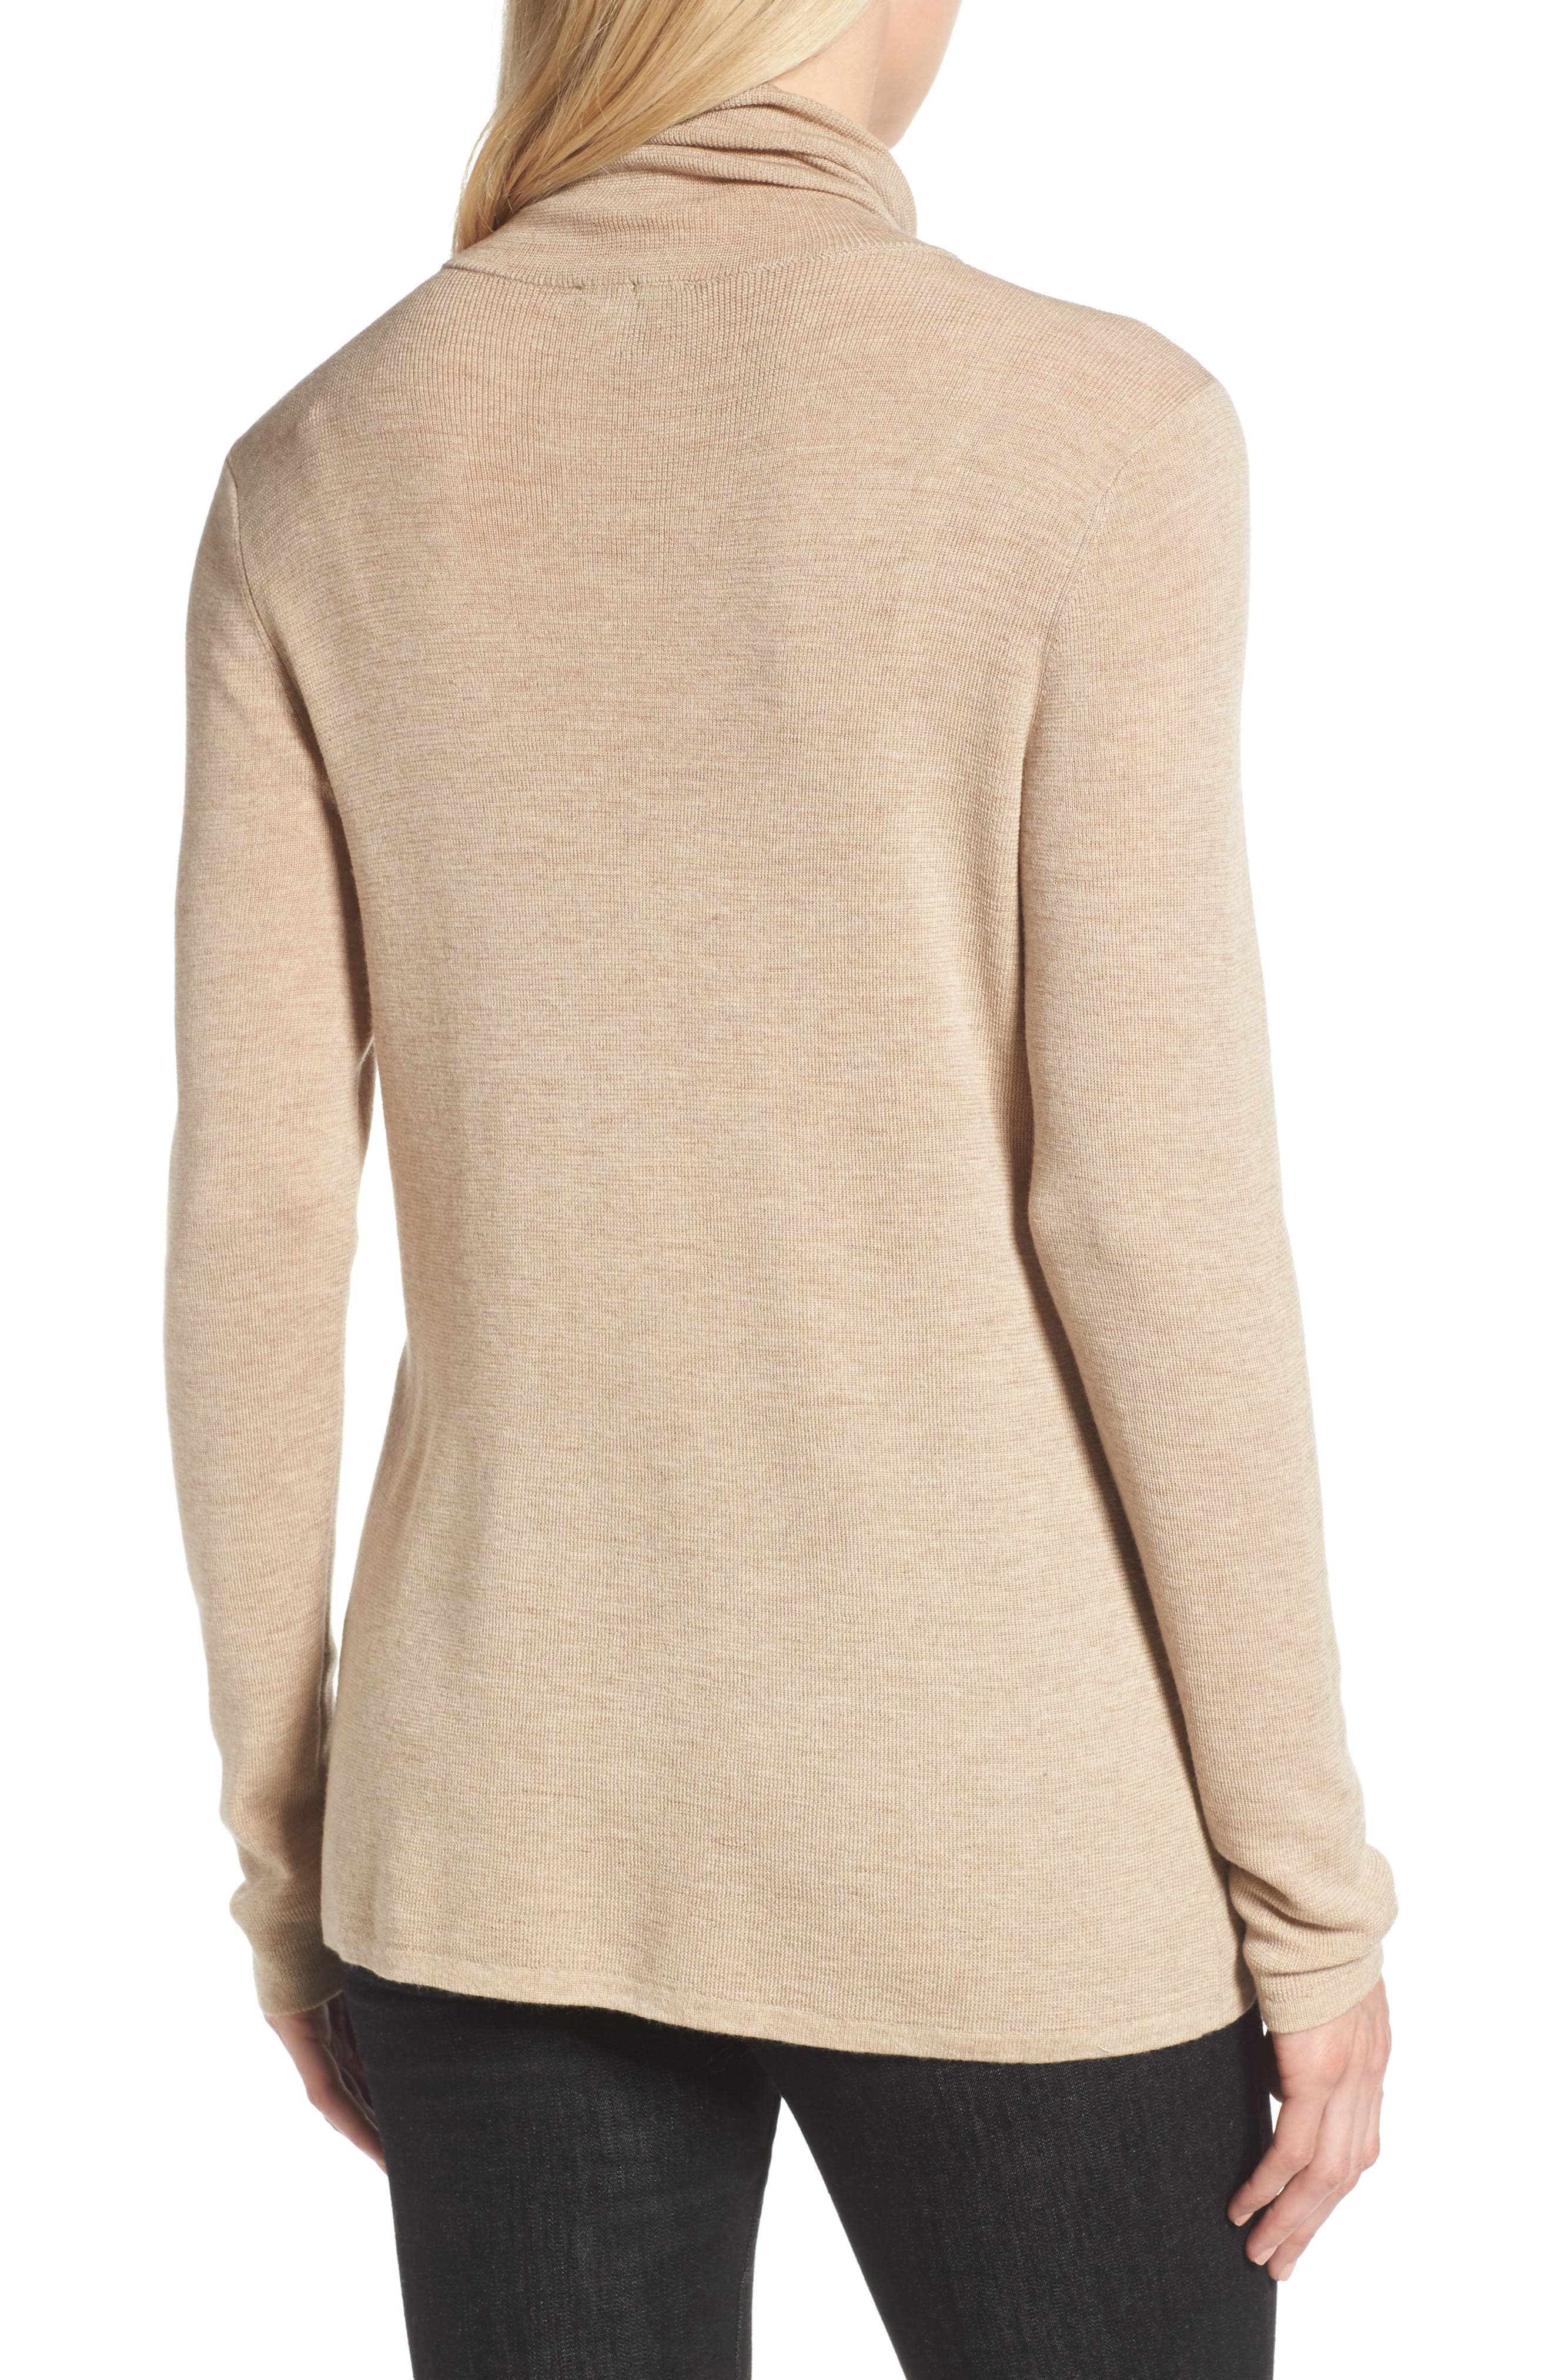 The Fisher Project Ultrafine Merino Turtleneck Sweater,                             Alternate thumbnail 2, color,                             Maple Oat